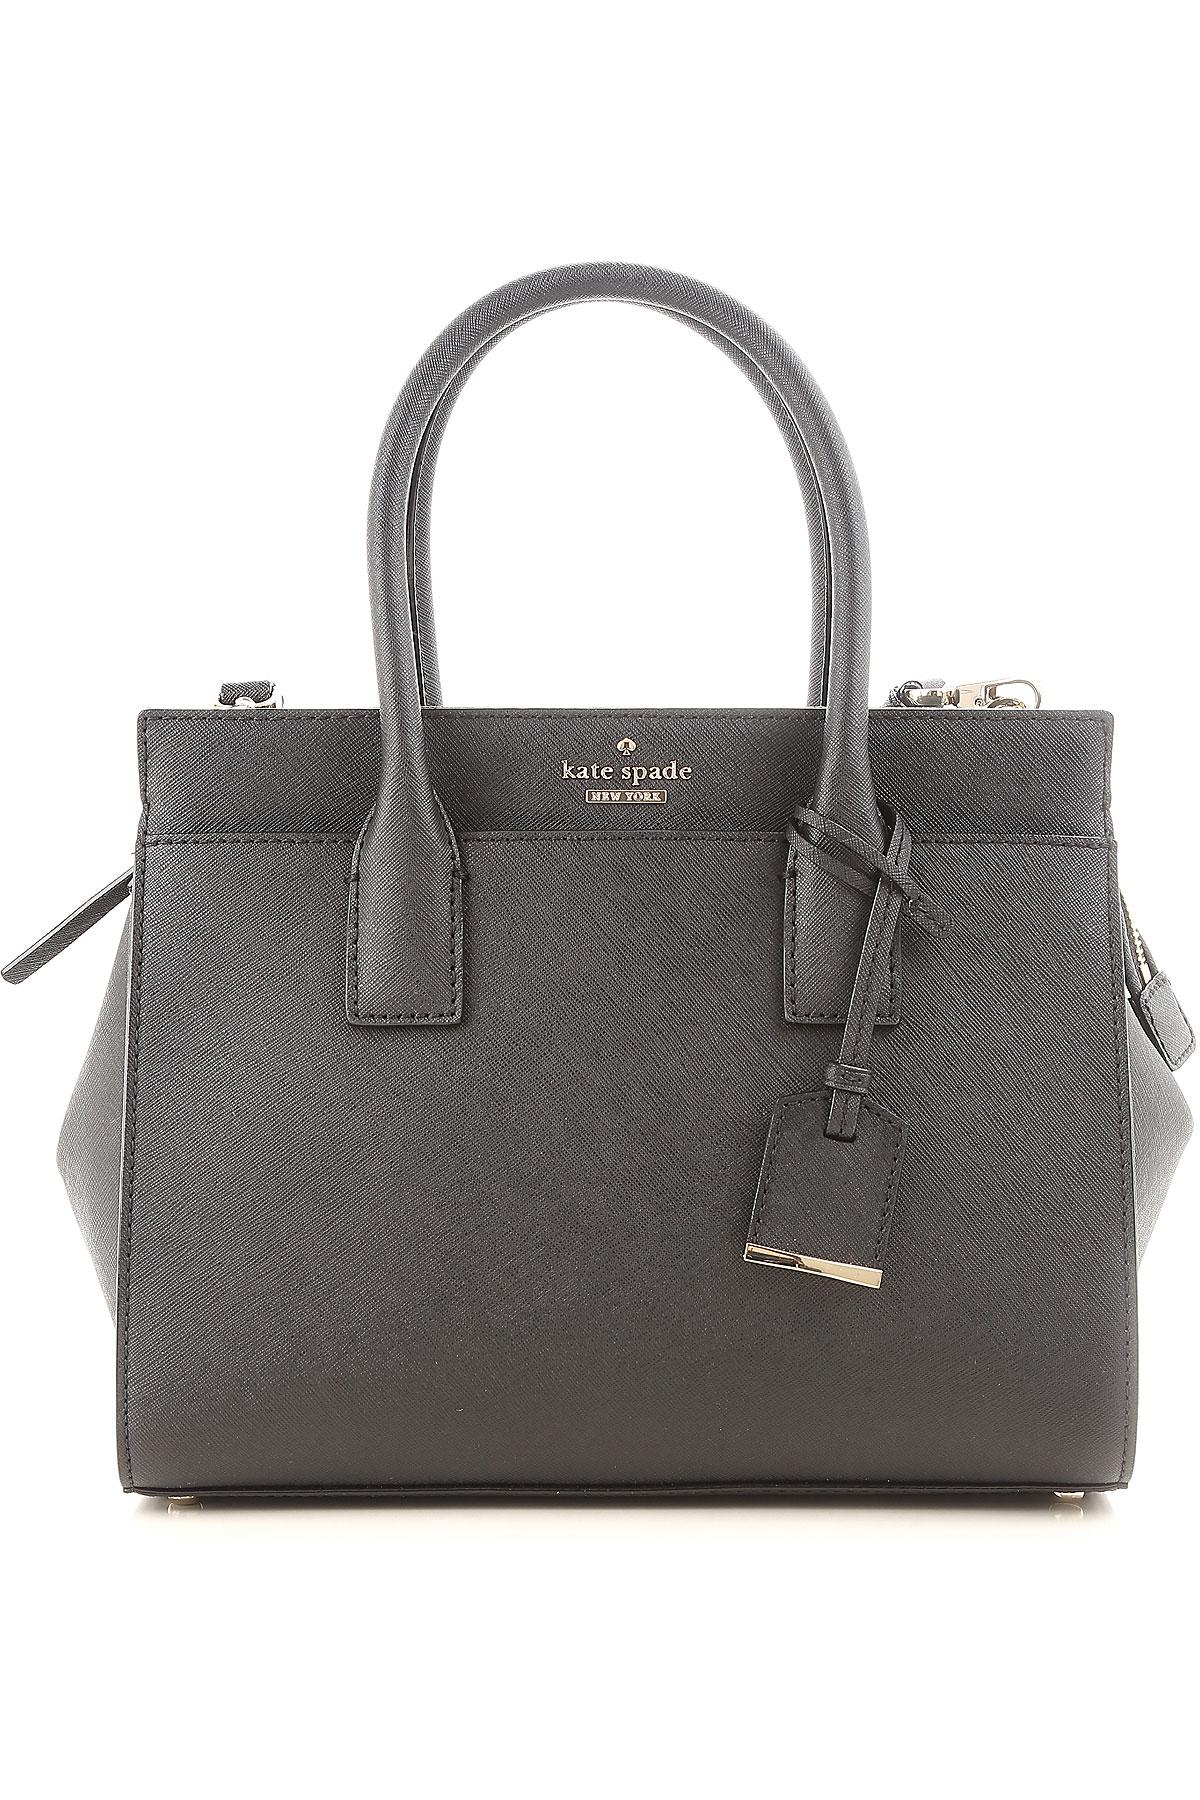 Image of Kate Spade Top Handle Handbag, Black, Leather, 2017